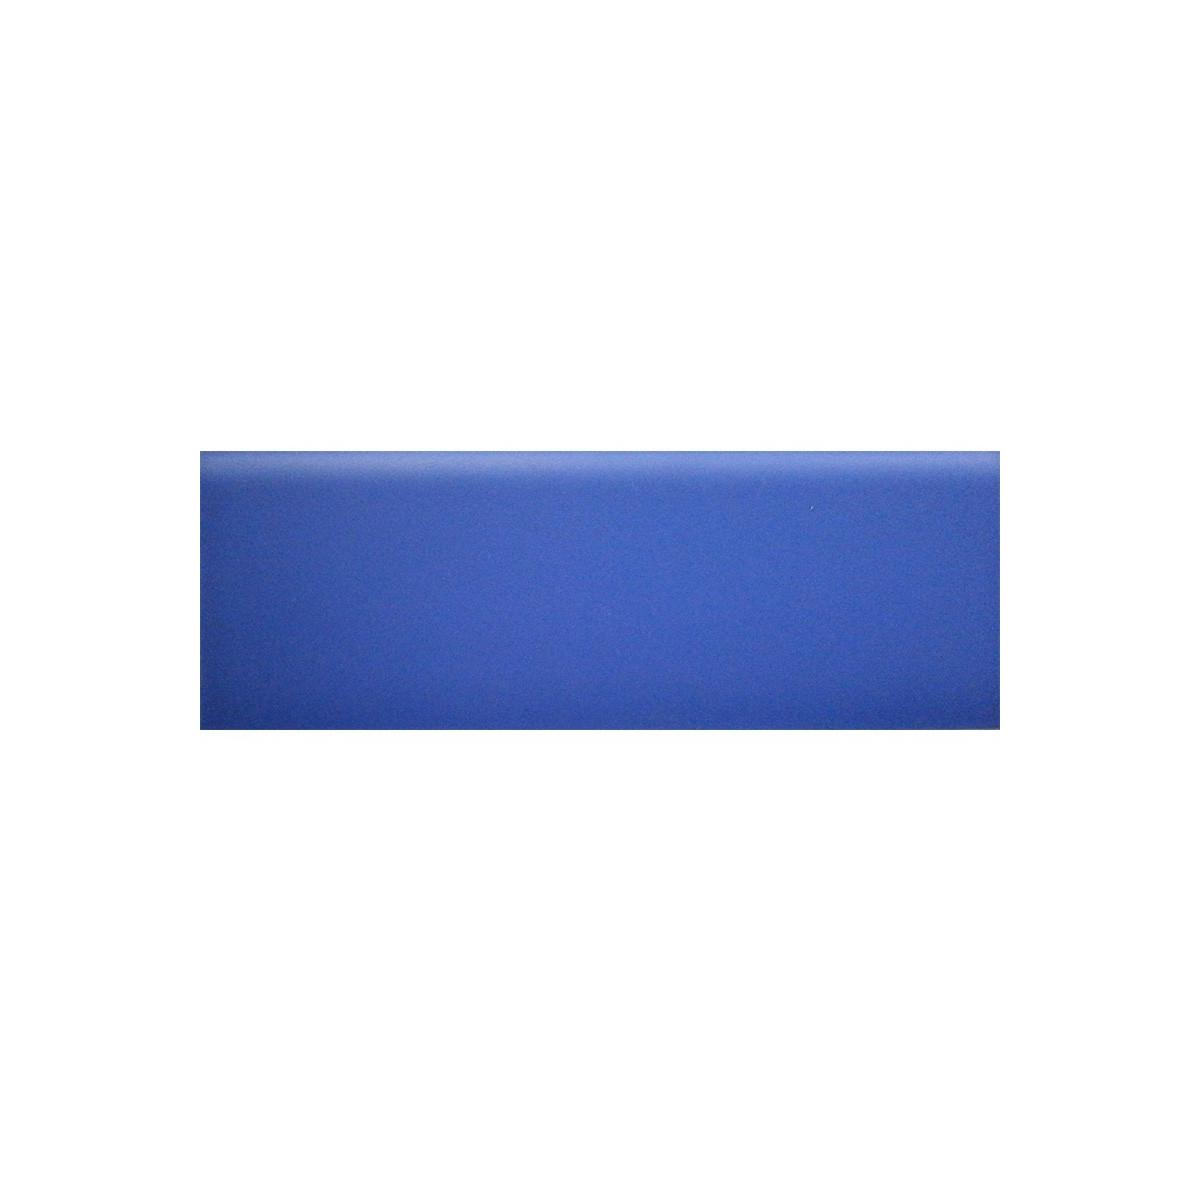 Rodapié Azul Victorian 7,5x20 (ud) - Colores lisos para combinar - Marca Mainzu